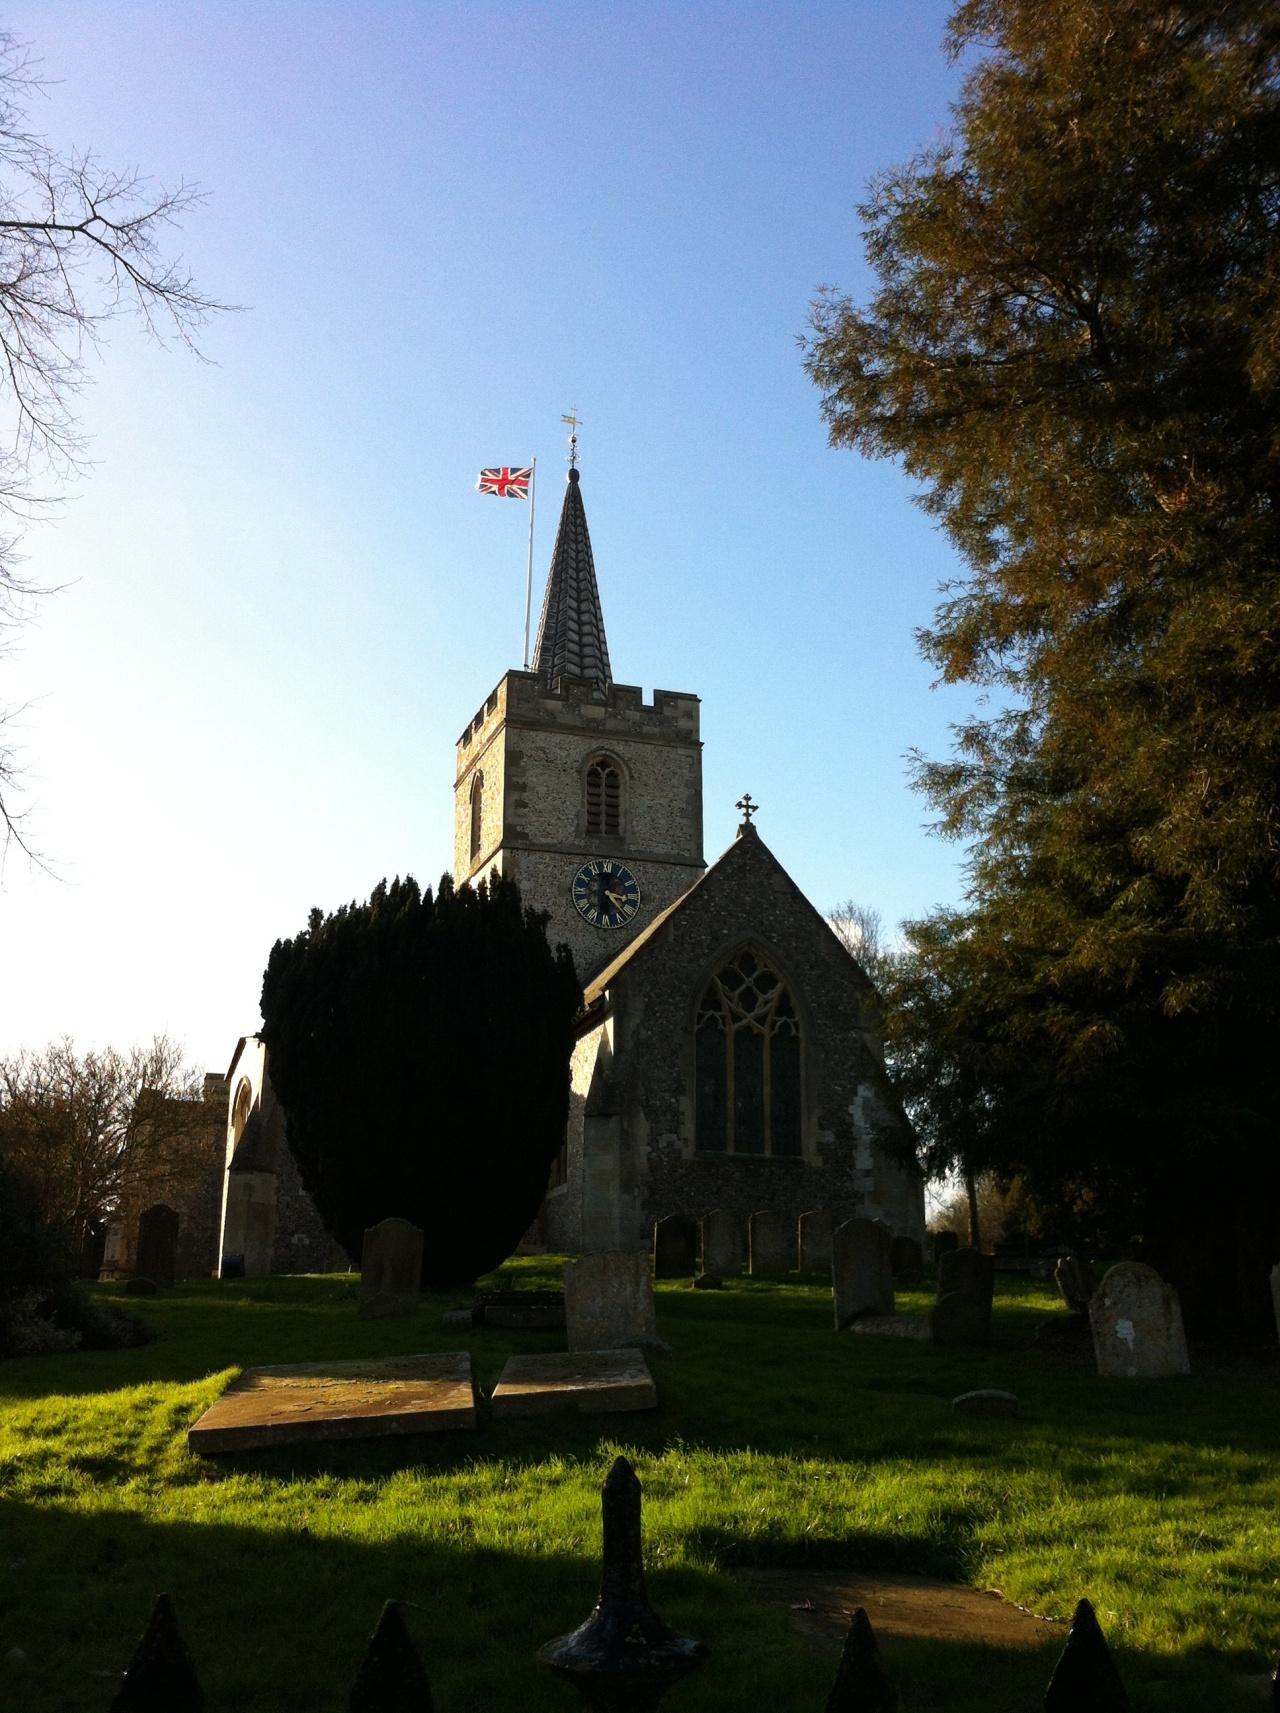 St. Mary's Church. Chesham, Buckinghamshire. [Photo by me, 2016.]